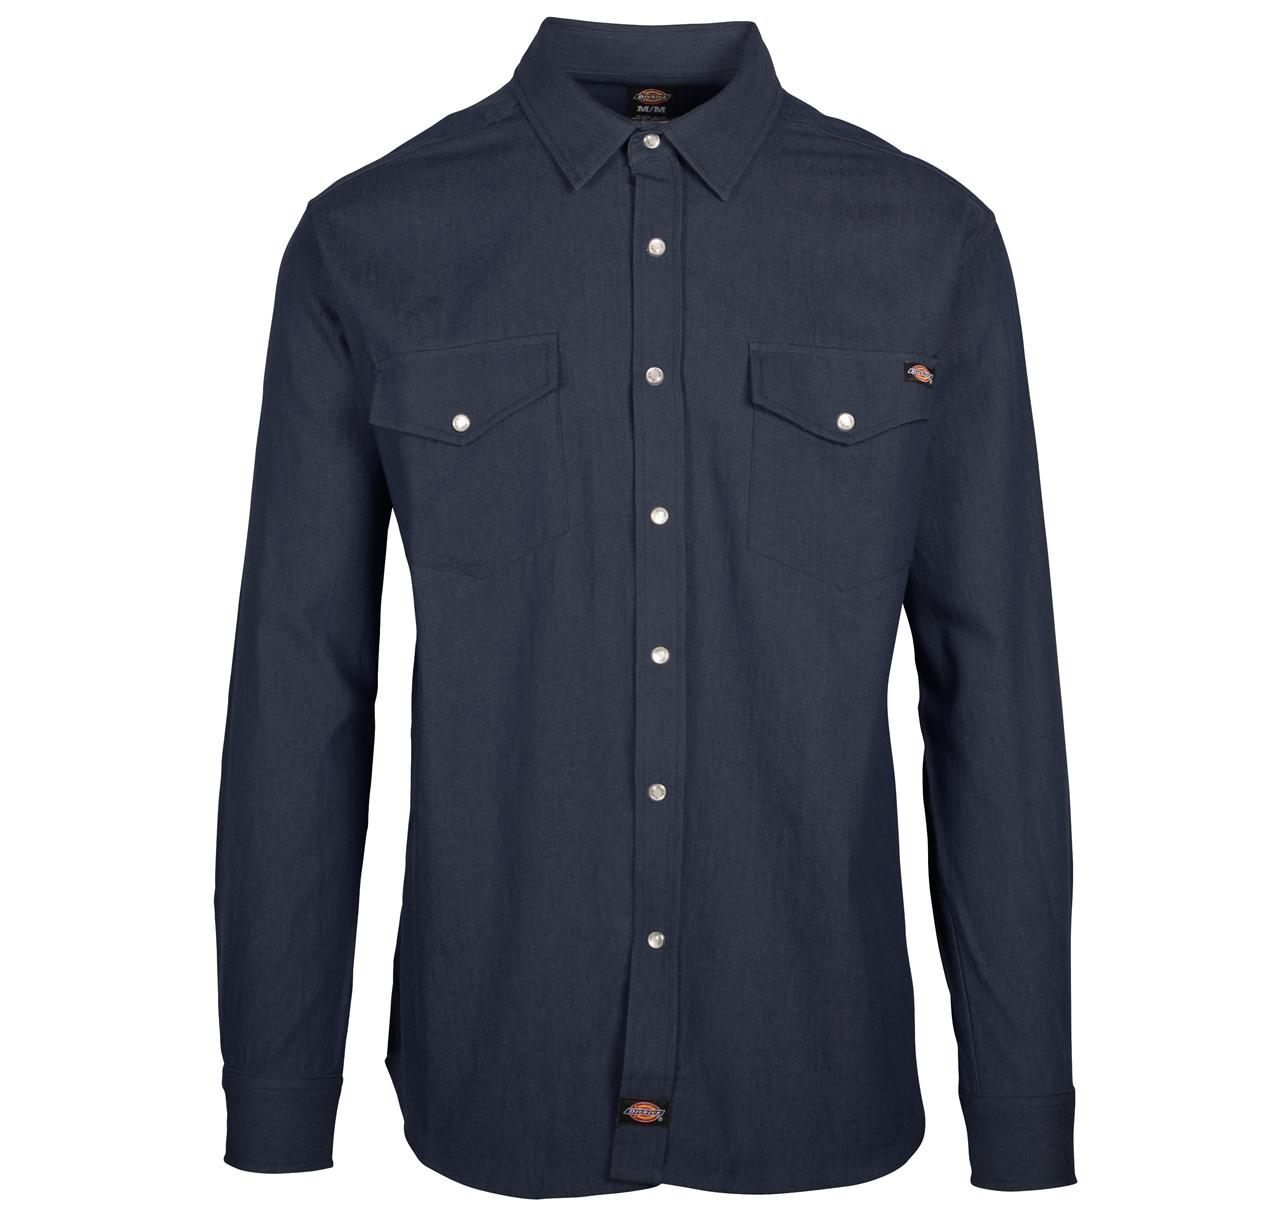 Picture of Dickies Long Sleeve Denim Shirt